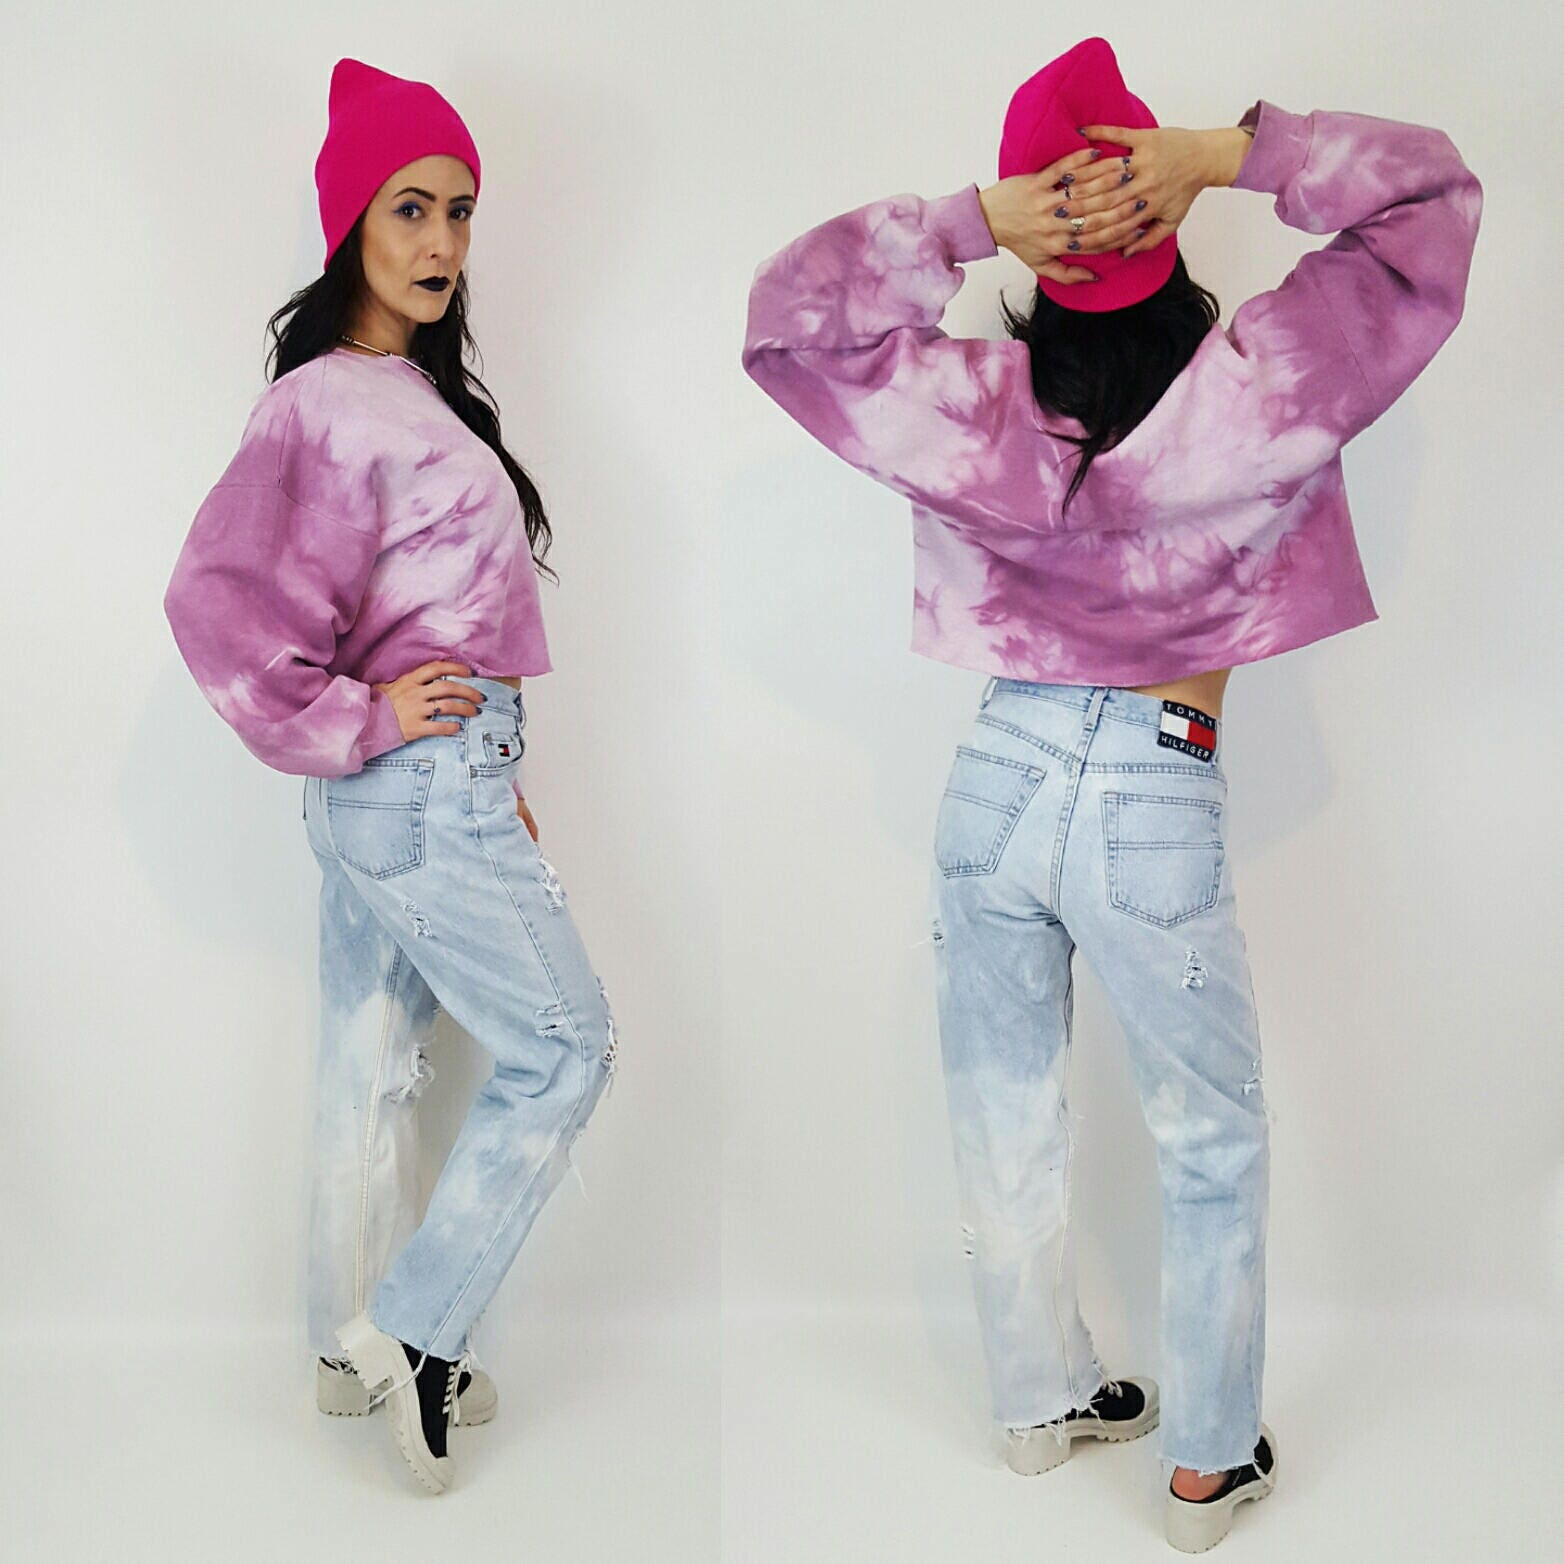 86b205281c0e7 ... Large Oversized Baggy Crop Top Sweatshirt - Logo Grunge Athletic Sweat  Shirt - Raw Hem Tie Dye Croptop. gallery photo gallery photo gallery photo  ...